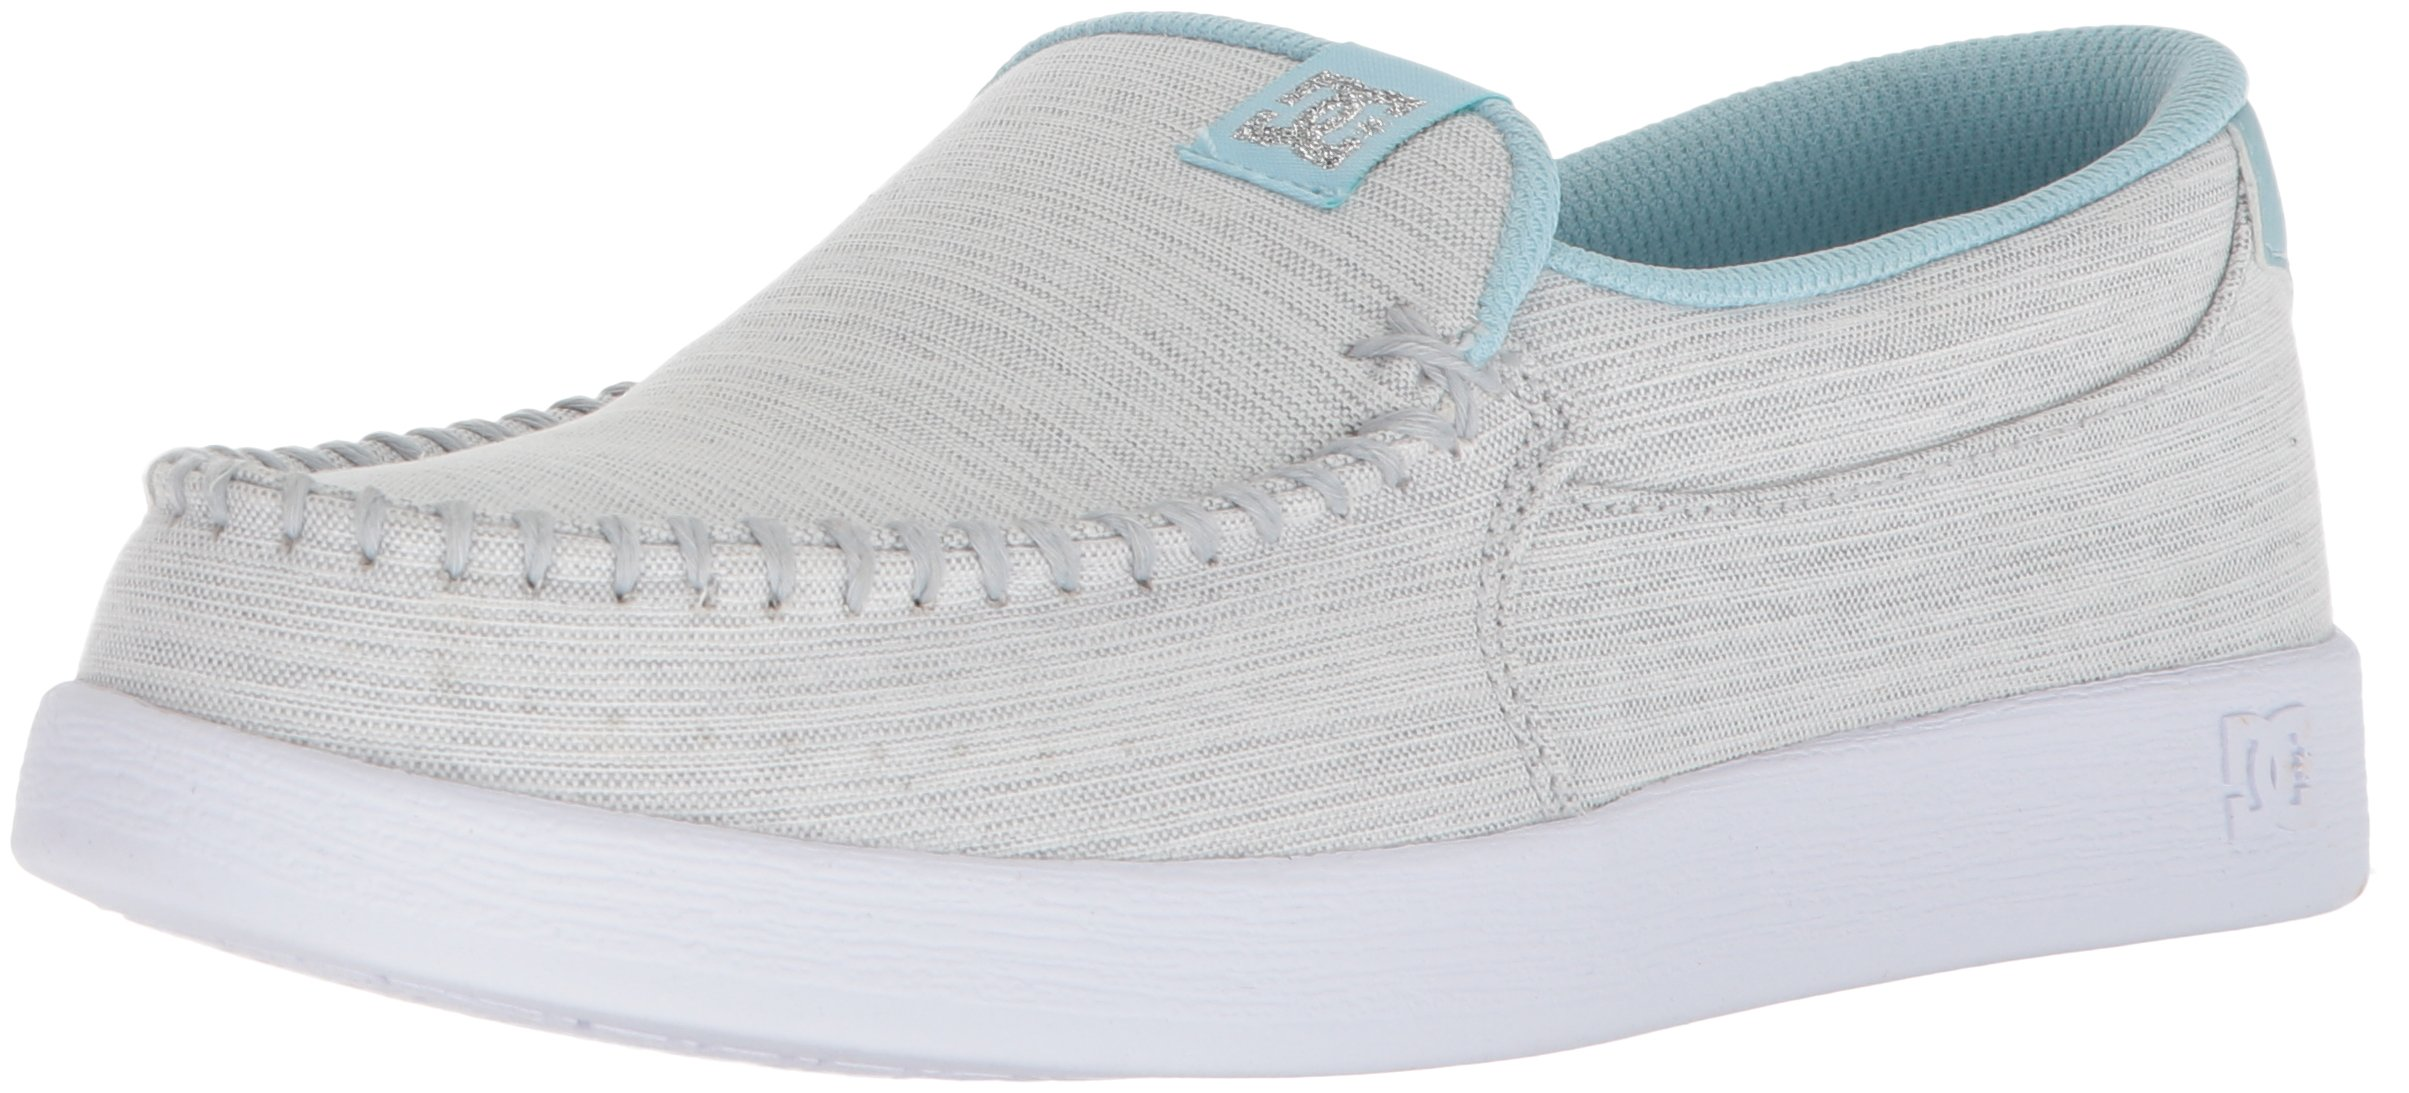 DC Women's Villain TX SE Skate Shoe, Light Grey/Blue, 10 B US